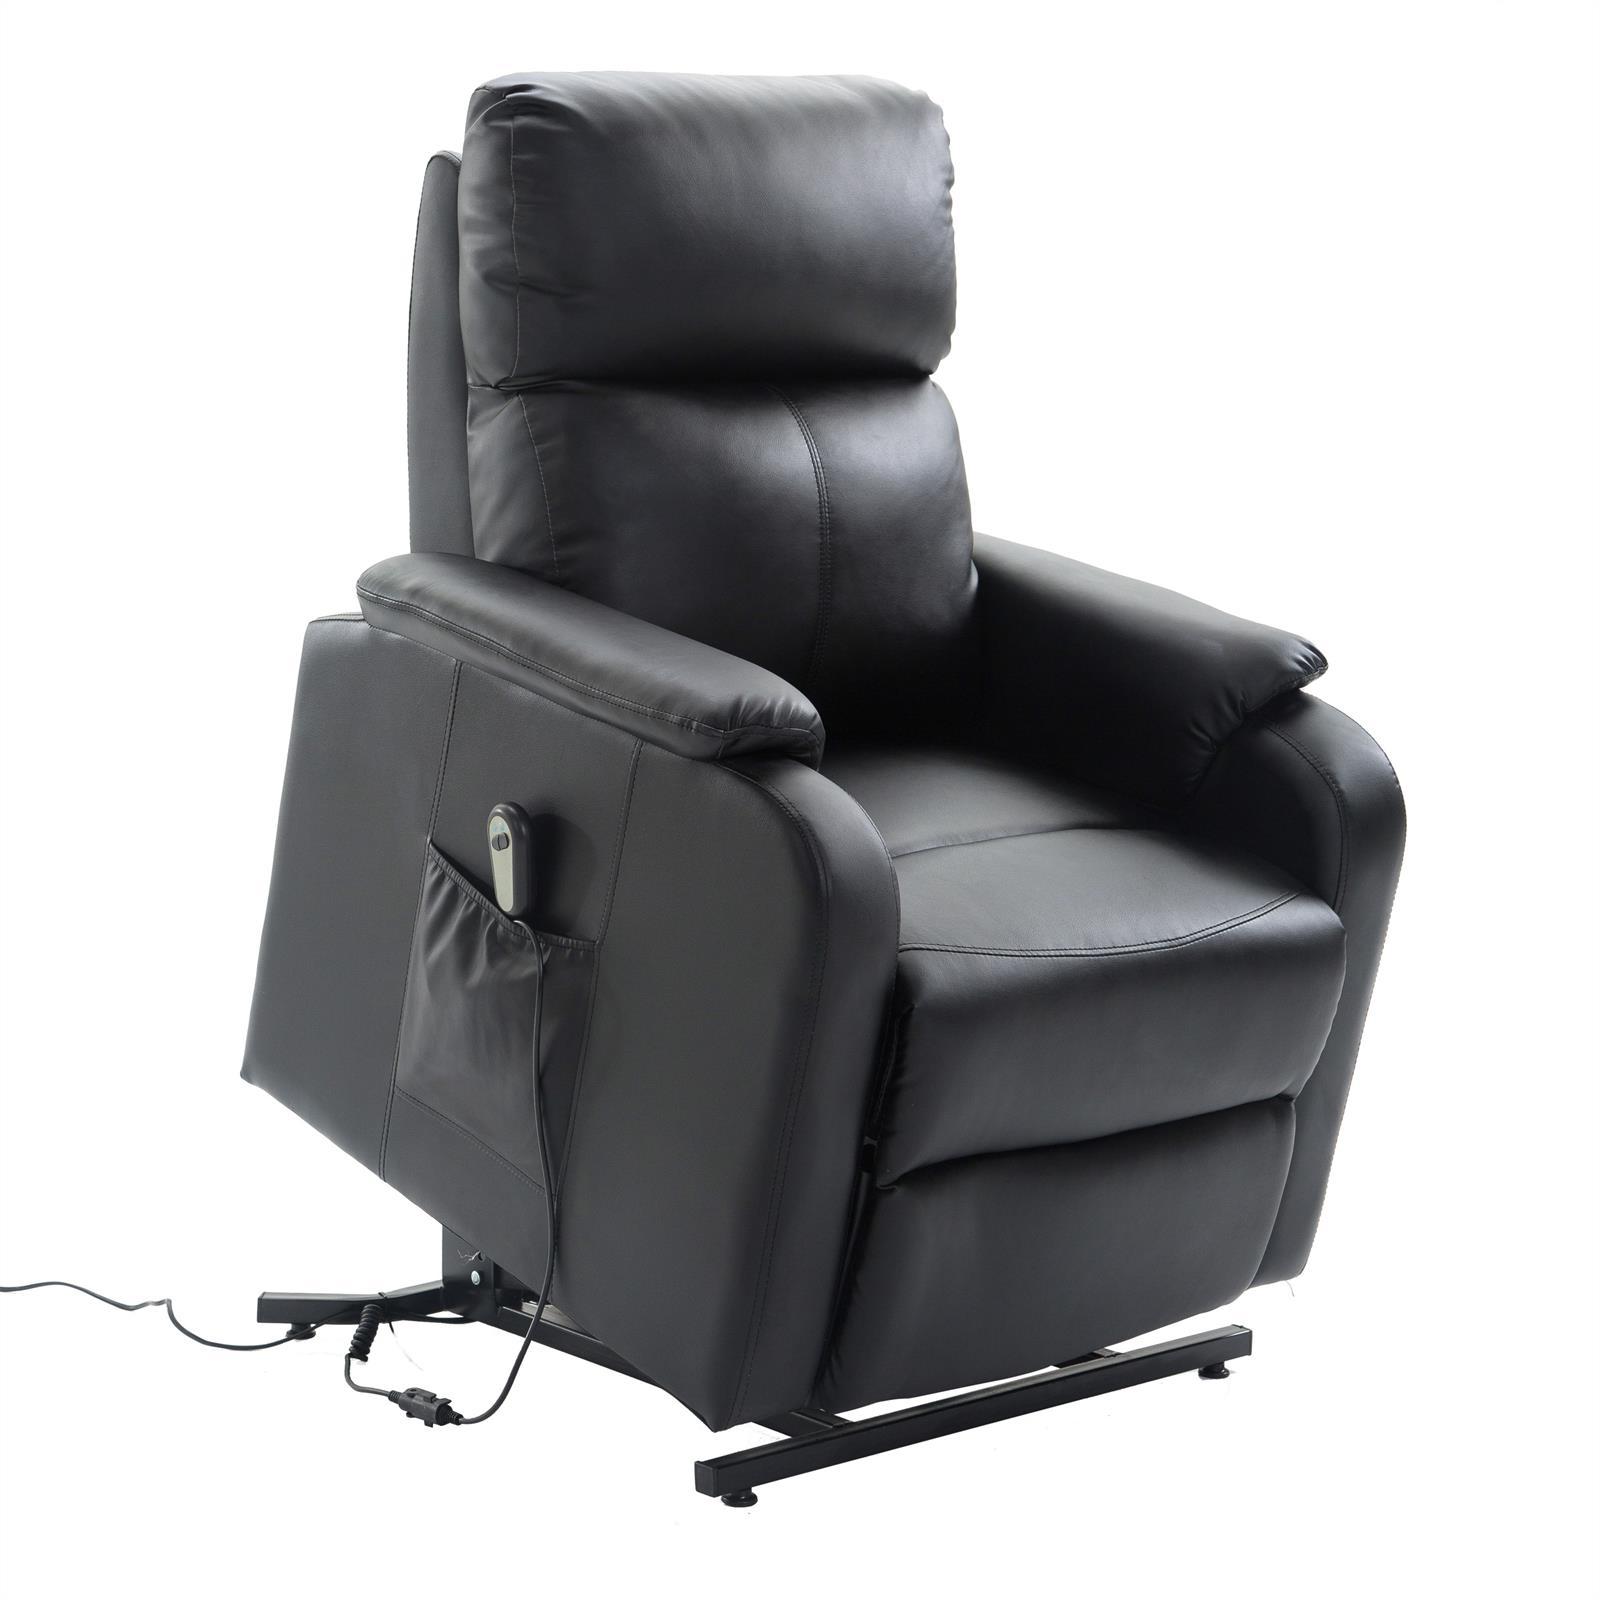 relaxsessel fernsehsessel tv ruhe sessel mit aufstehhilfe elektrisch ebay. Black Bedroom Furniture Sets. Home Design Ideas